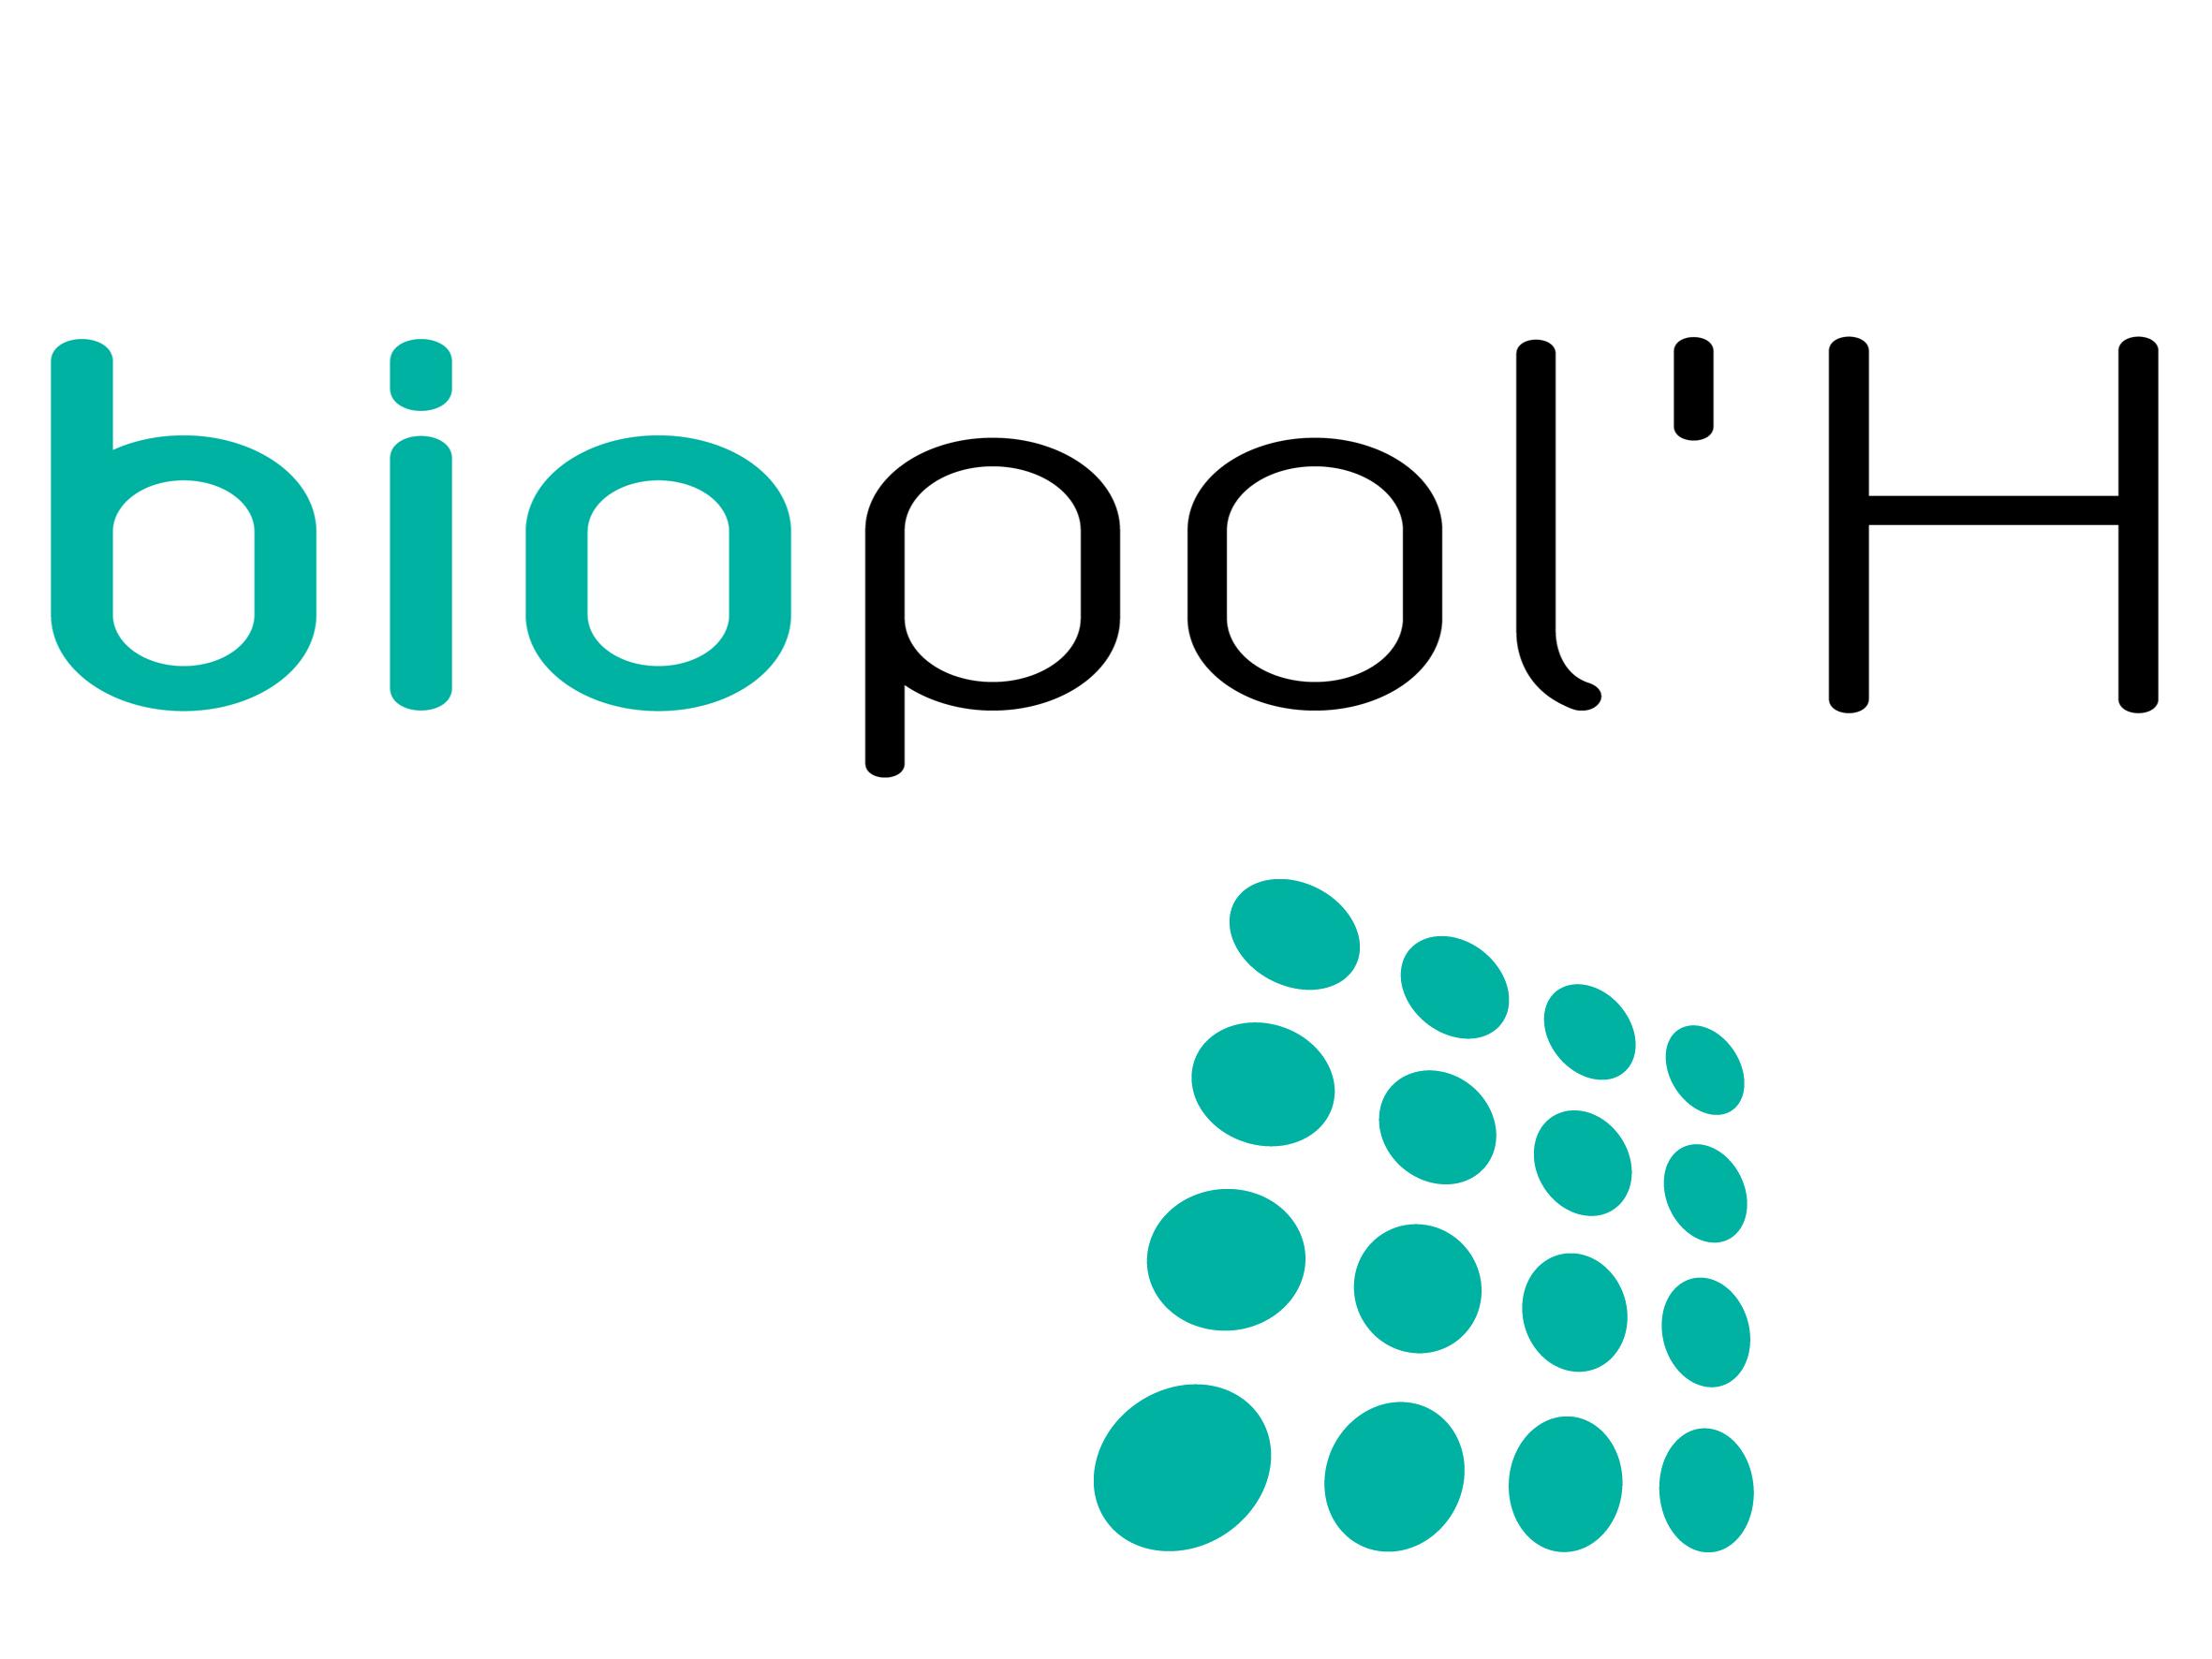 Biopol